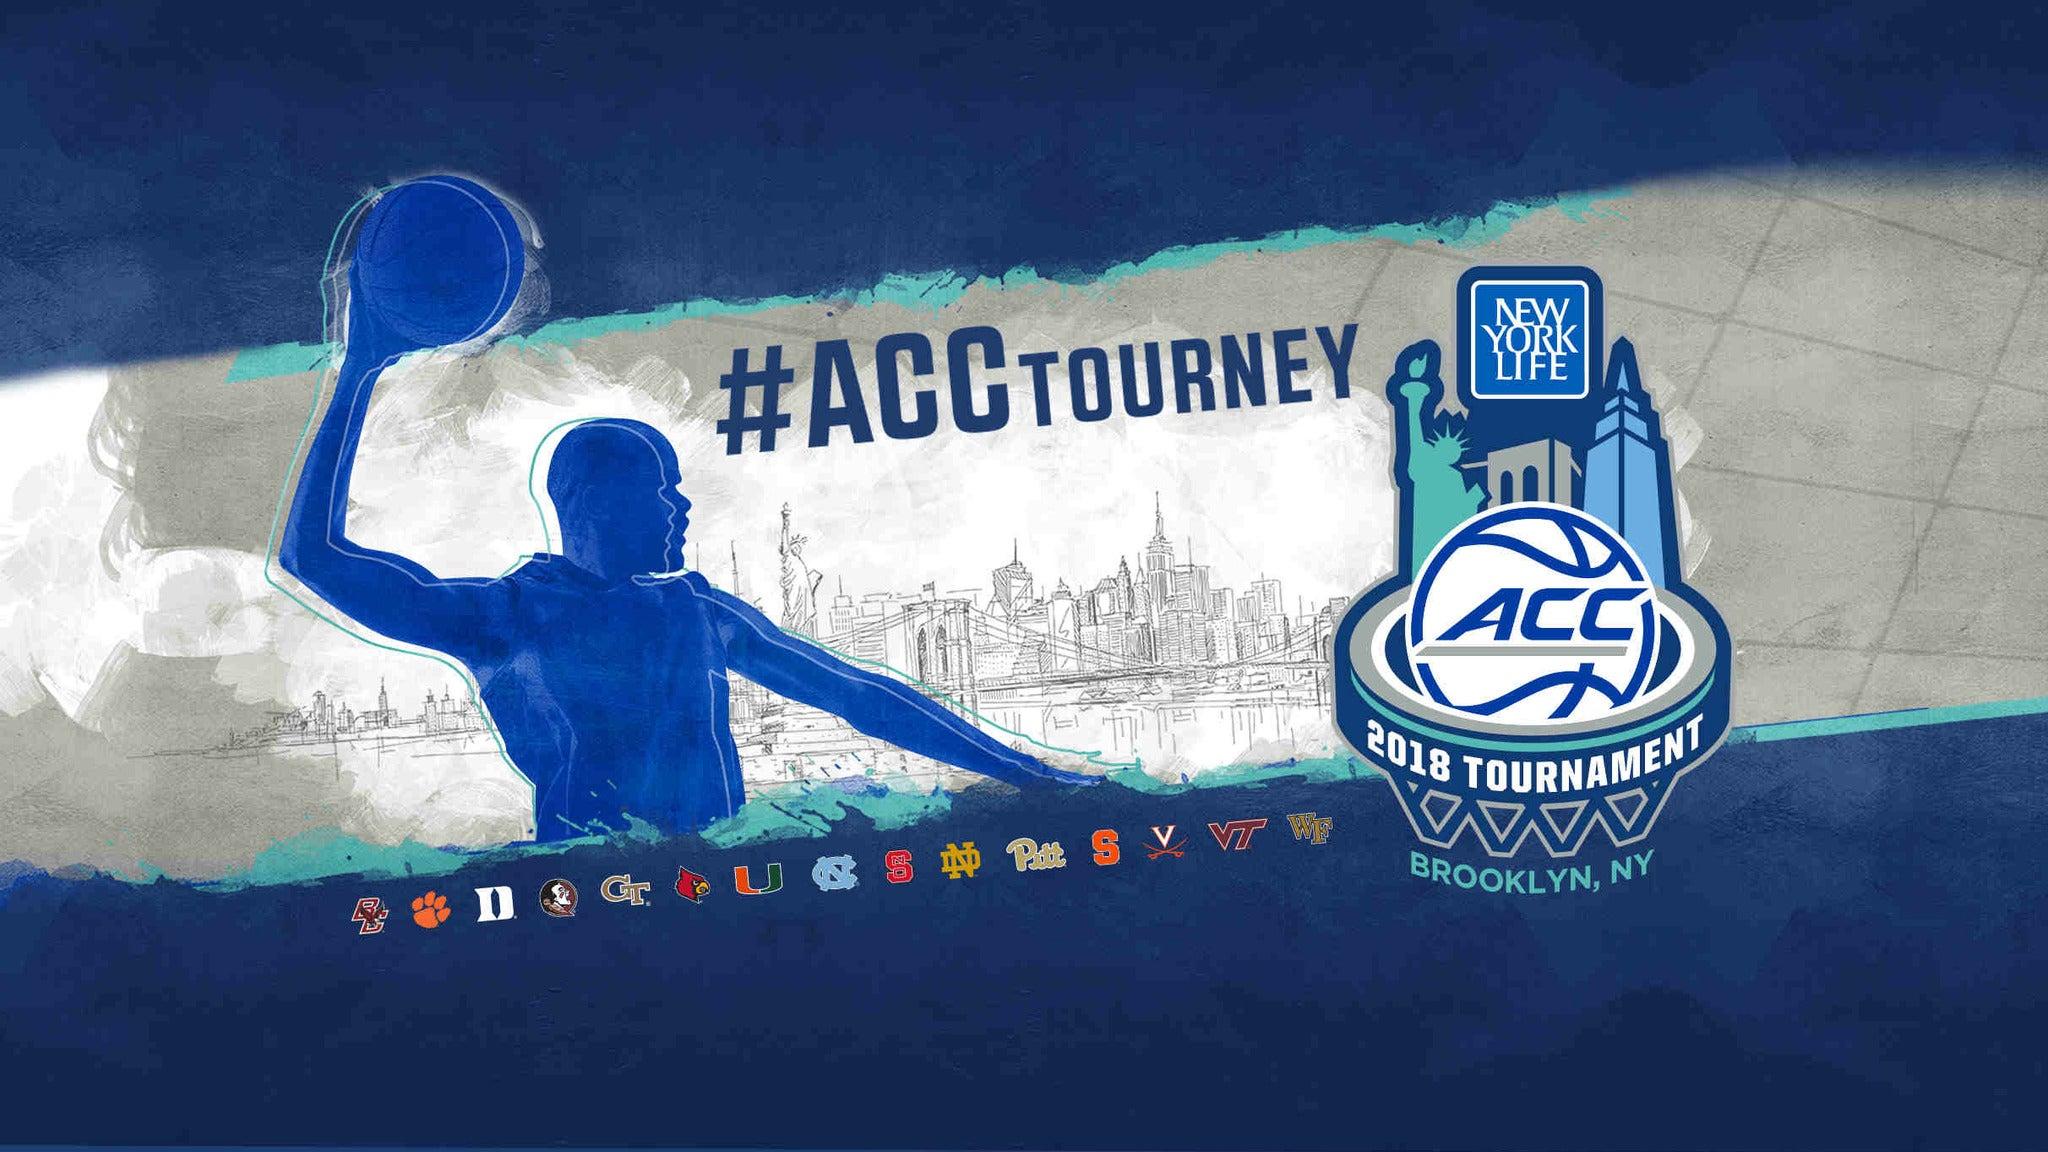 2020 New York Life ACC Tournament Session 1